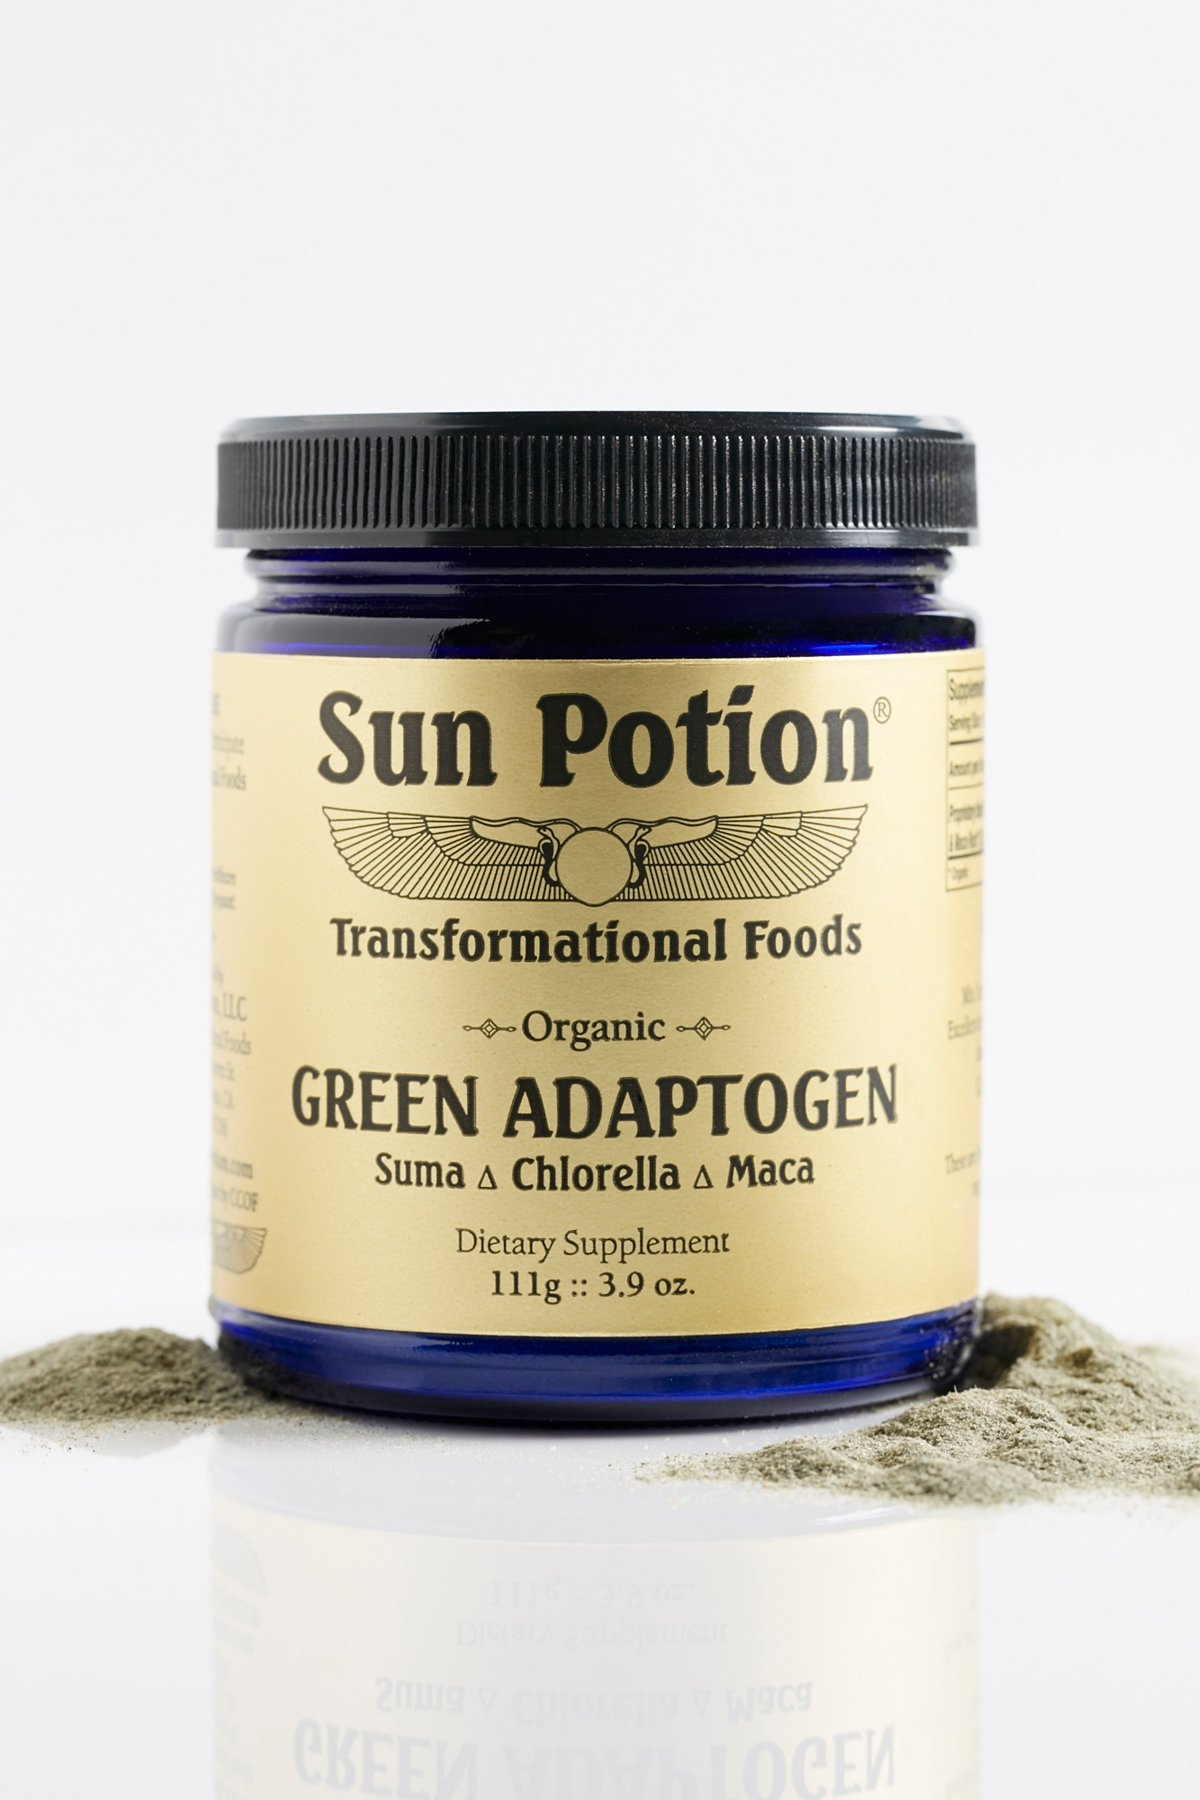 Green Adaptogen Supplement